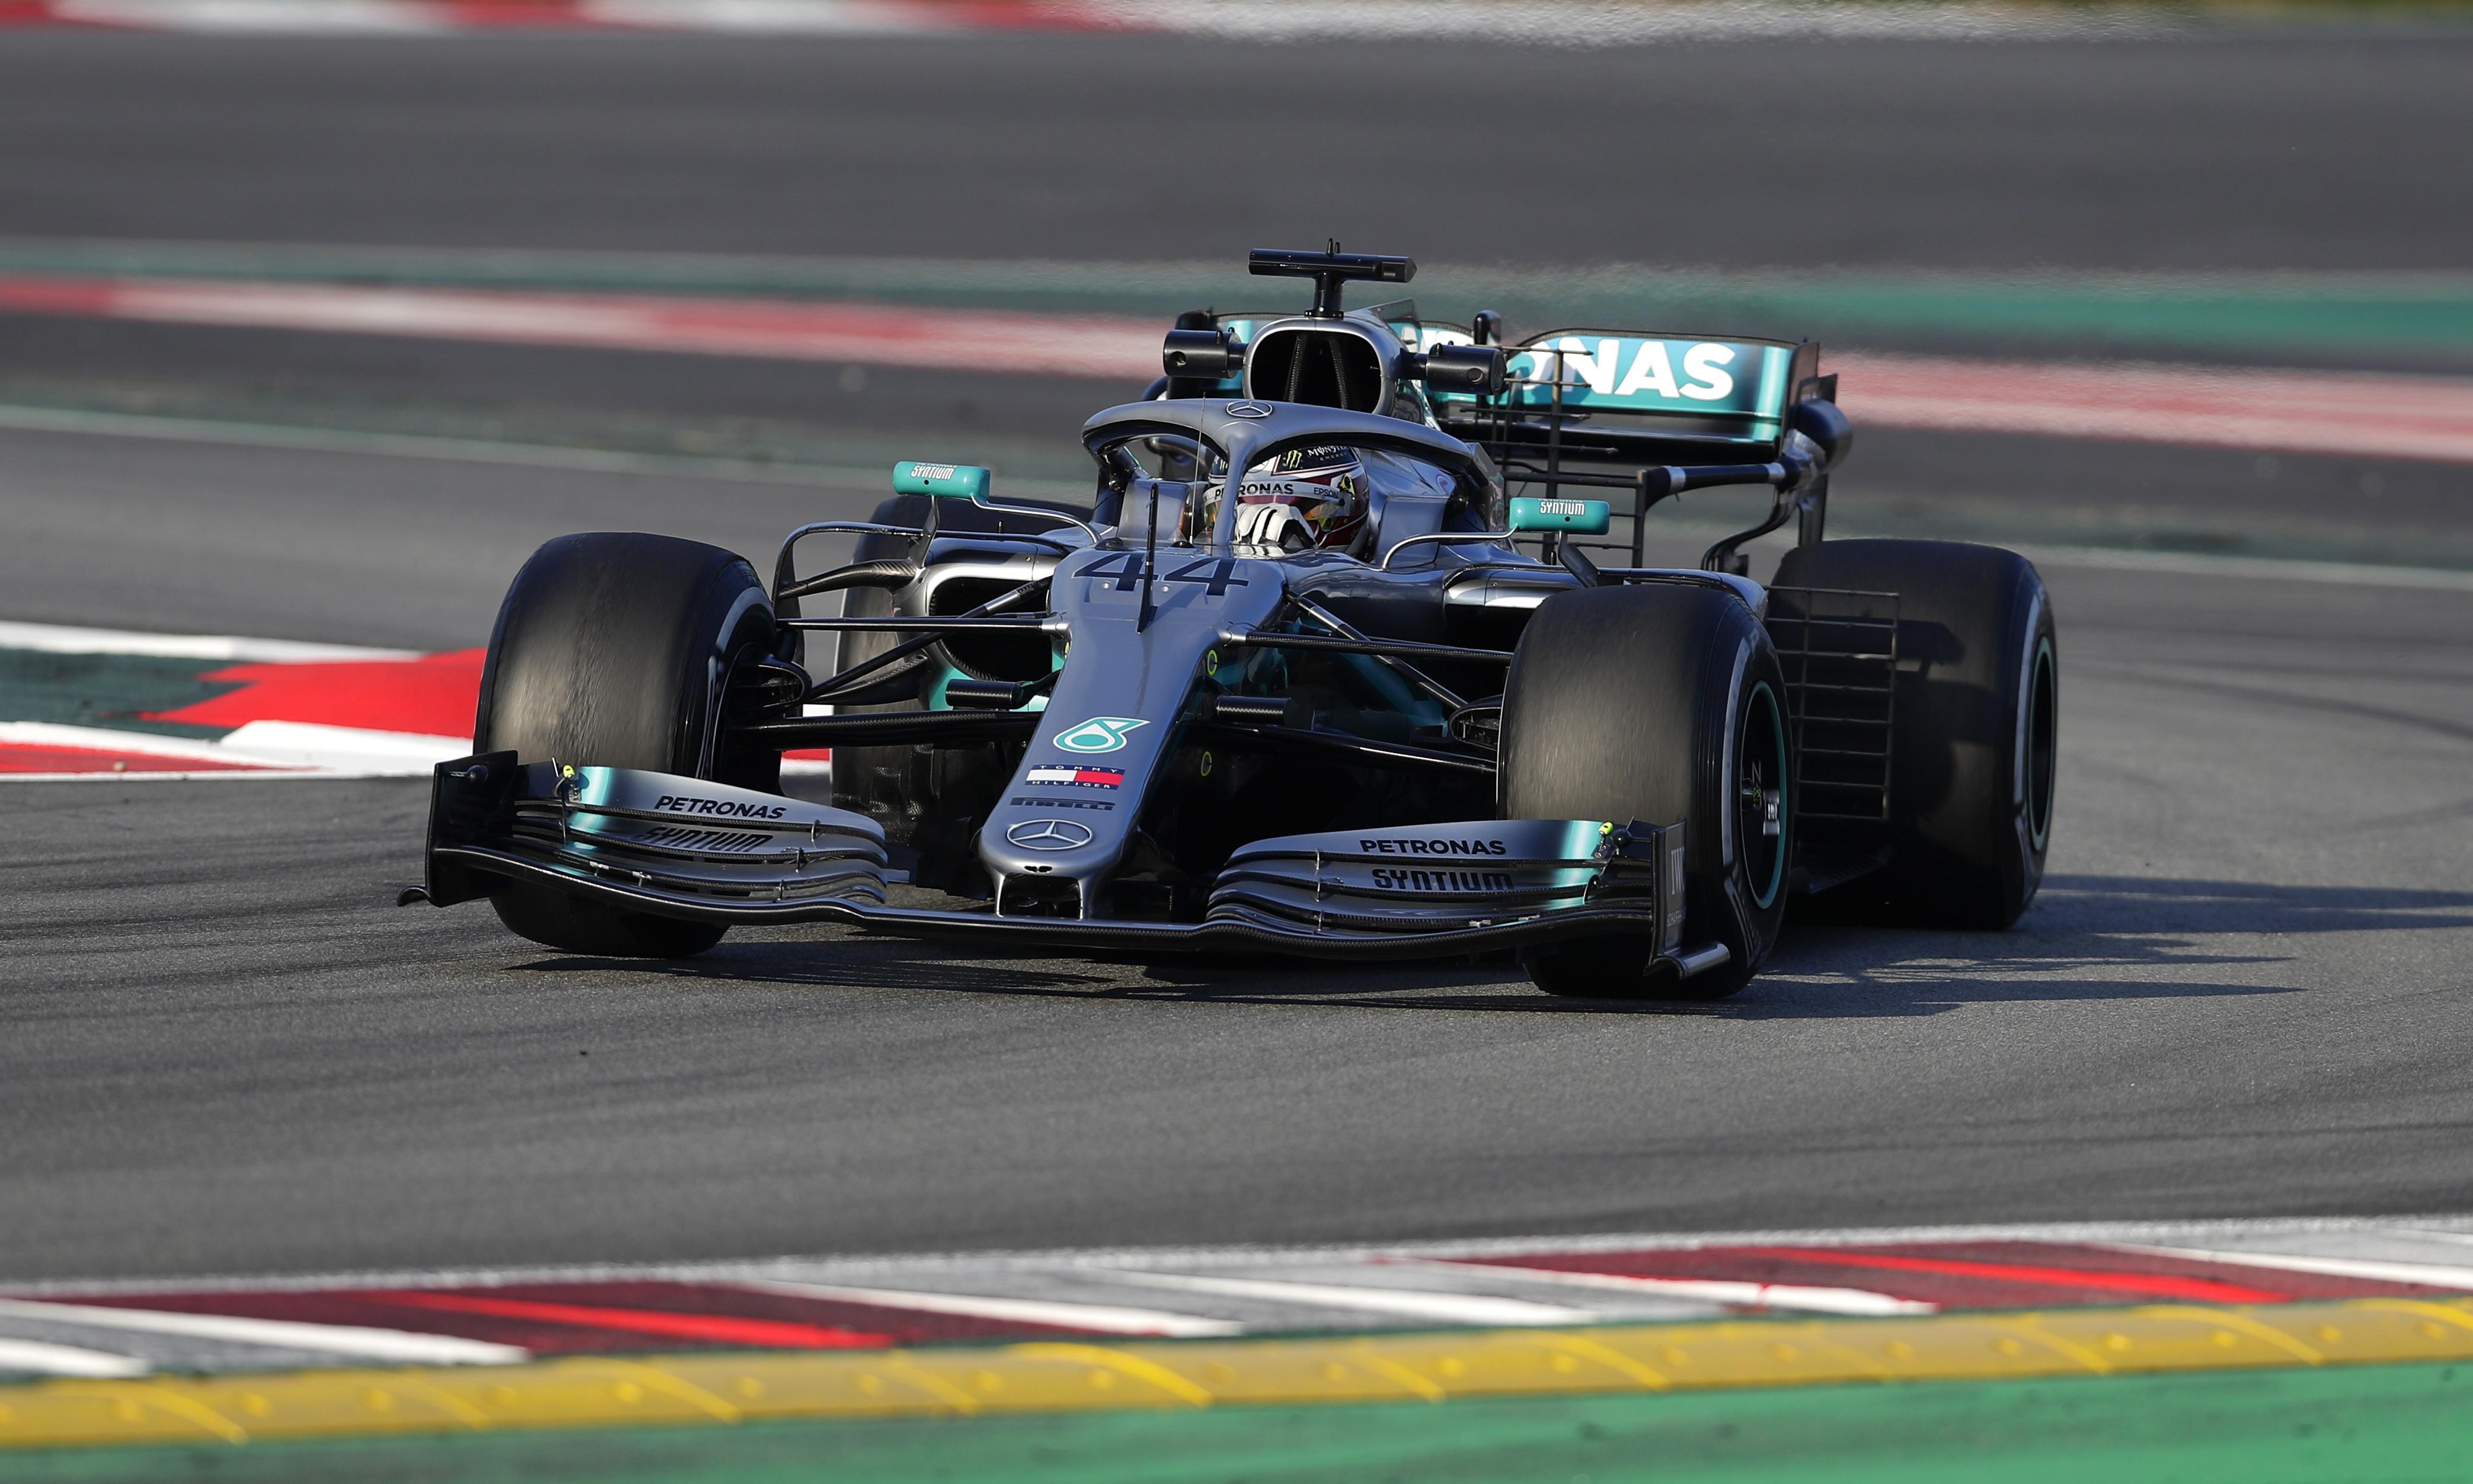 Mercedes enjoy constructive winter but Williams sleep through alarm